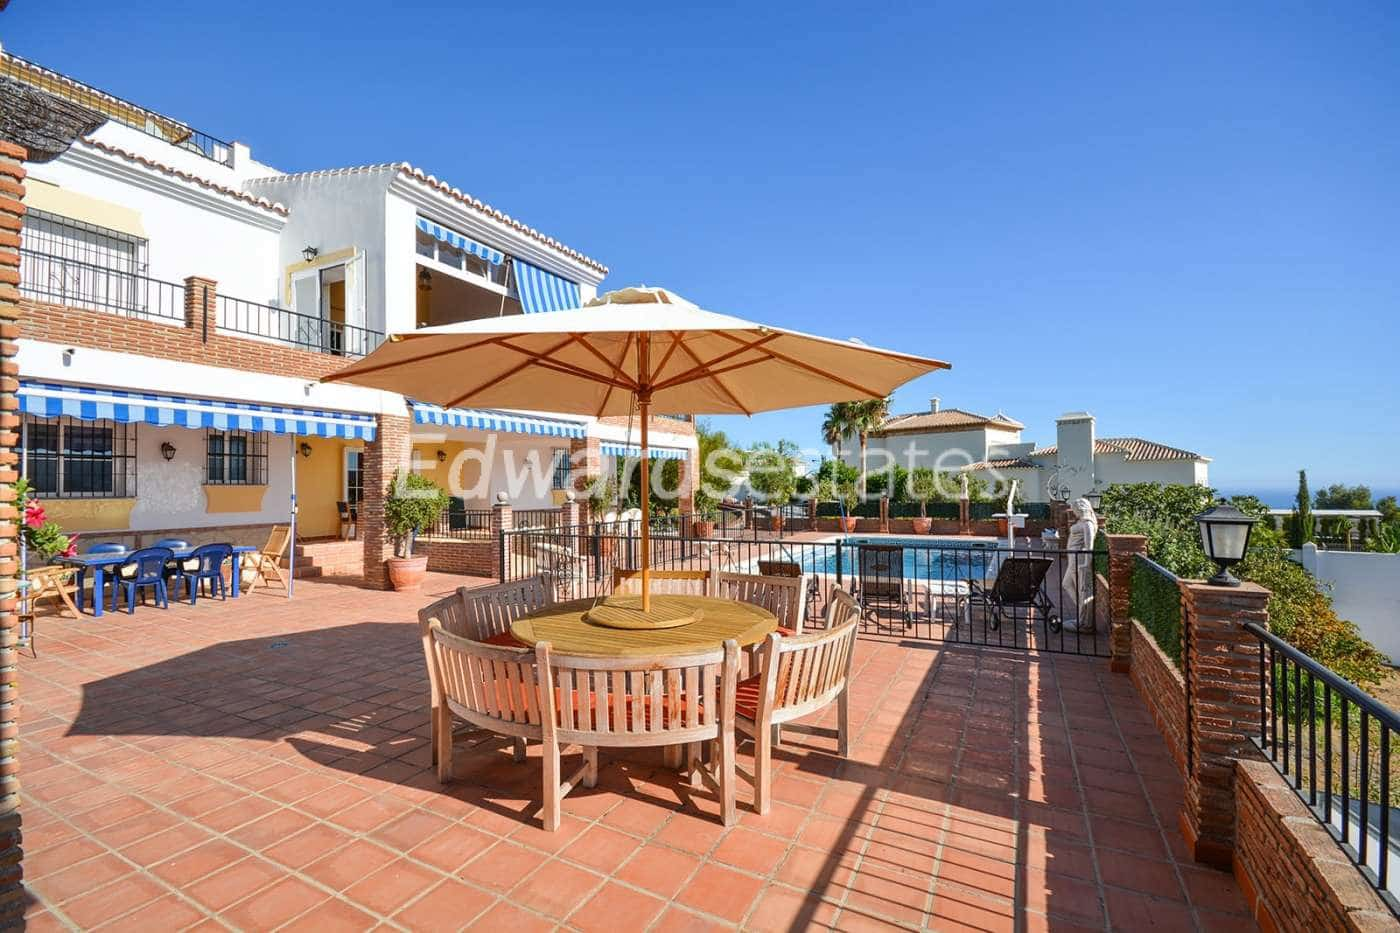 6 bedroom Villa for sale in Nerja with pool garage - € 995,000 (Ref: 2348316)